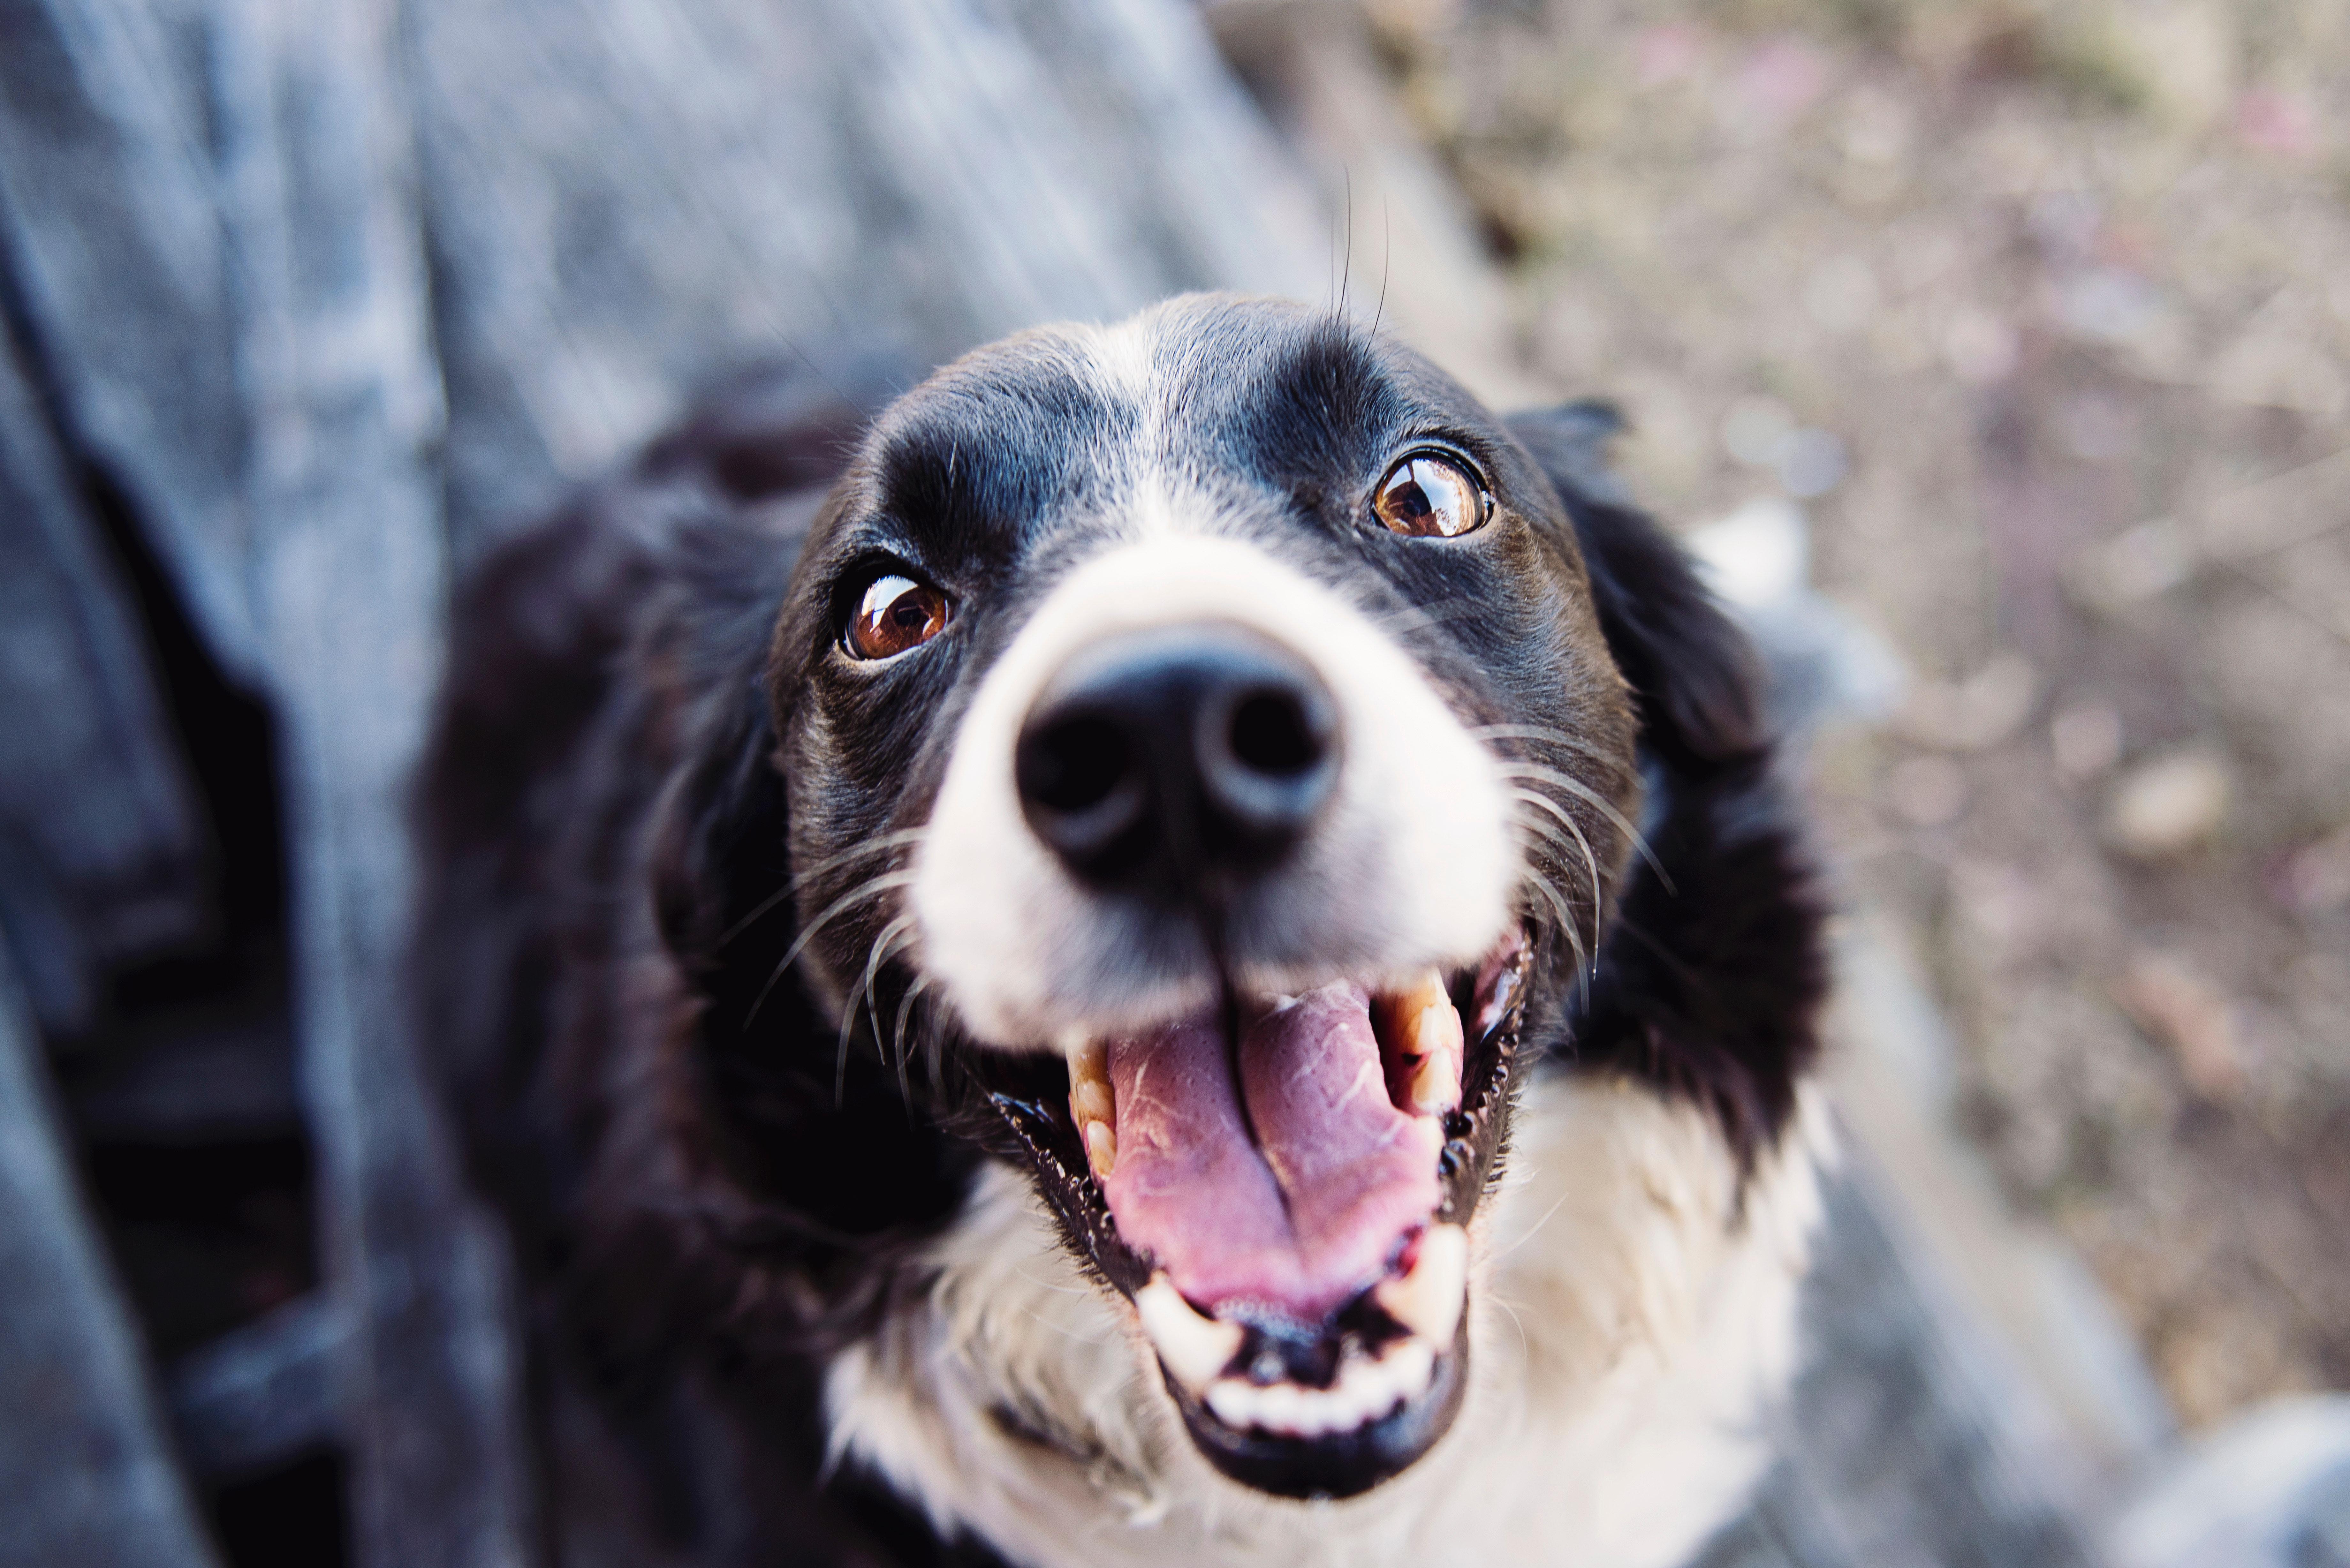 Dog images · Pexels · Free Stock Photos